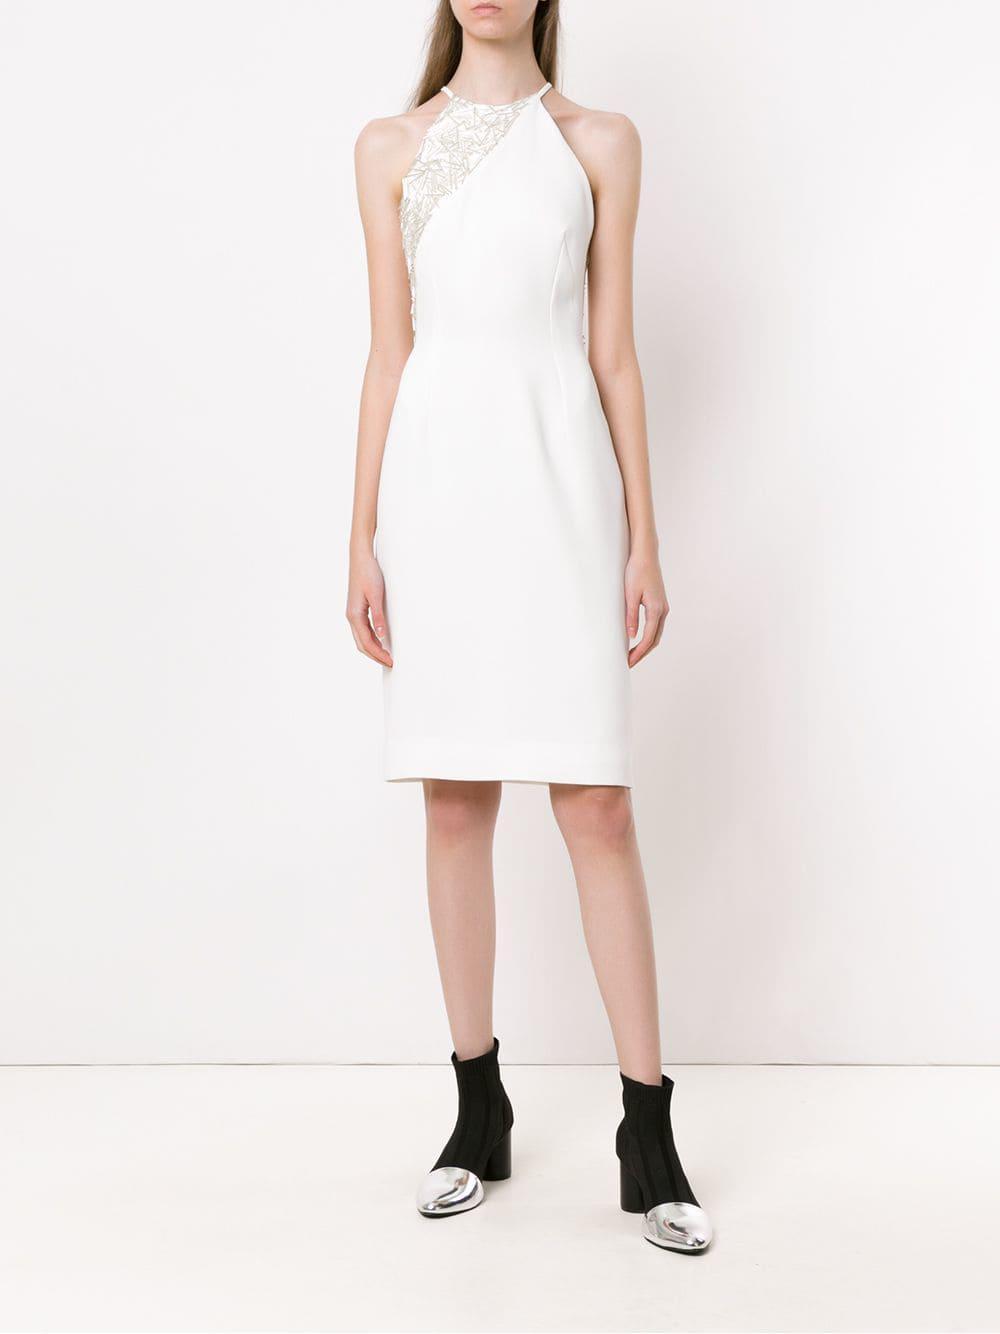 d212e5b384 Gloria Coelho Embroidered Detail Dress in White - Lyst